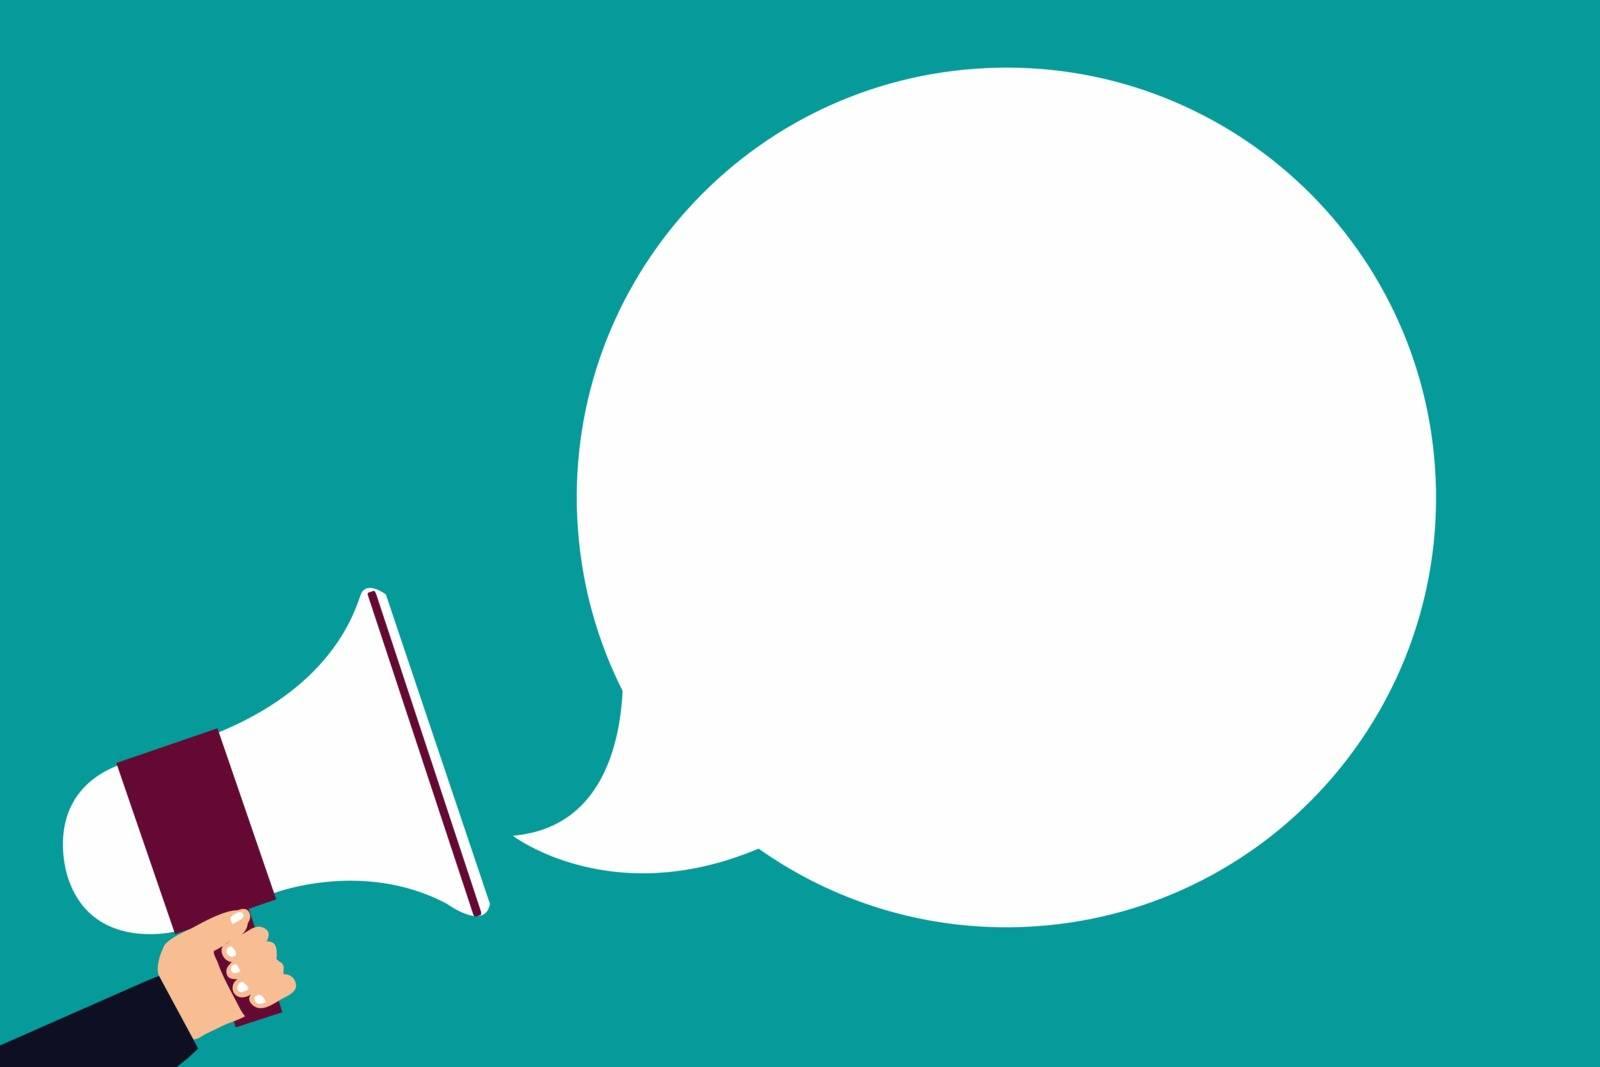 Flat design business illustration concept Digital marketing business holding megaphone for website and promotion banners. Cartoon human hand holding megaphone. social media concept